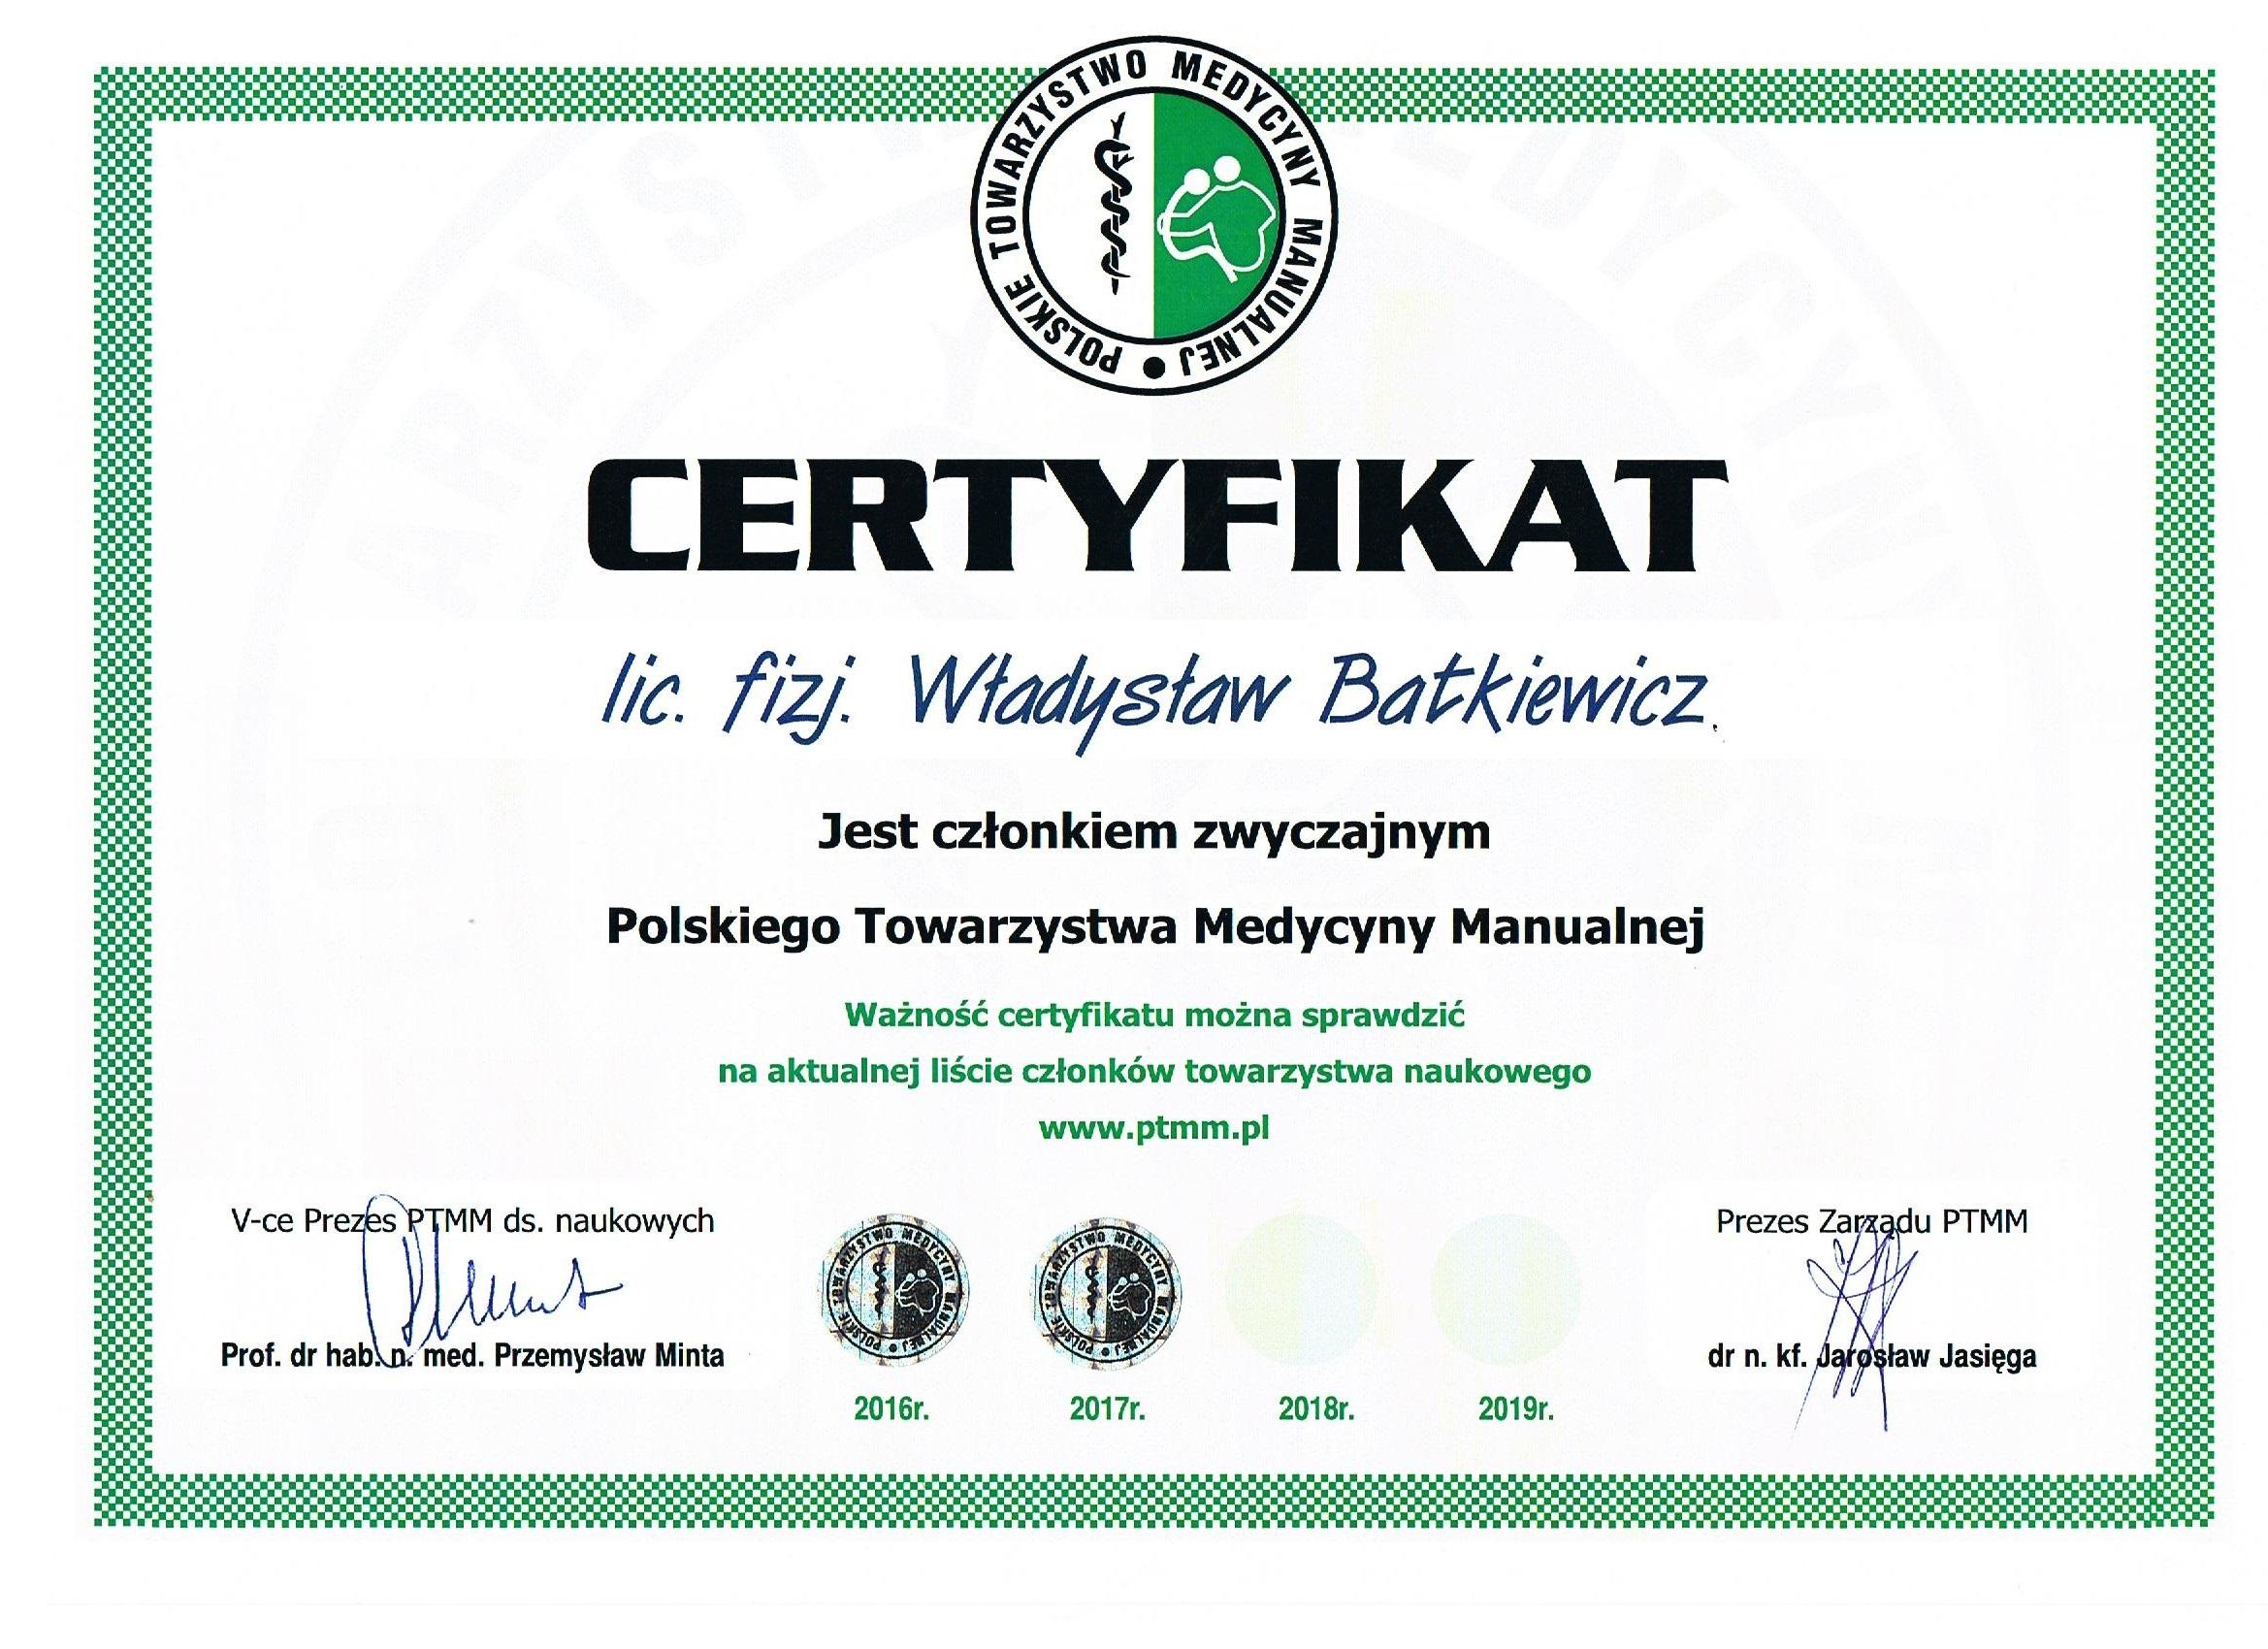 Certyfikat-PTMM-001-â-ok